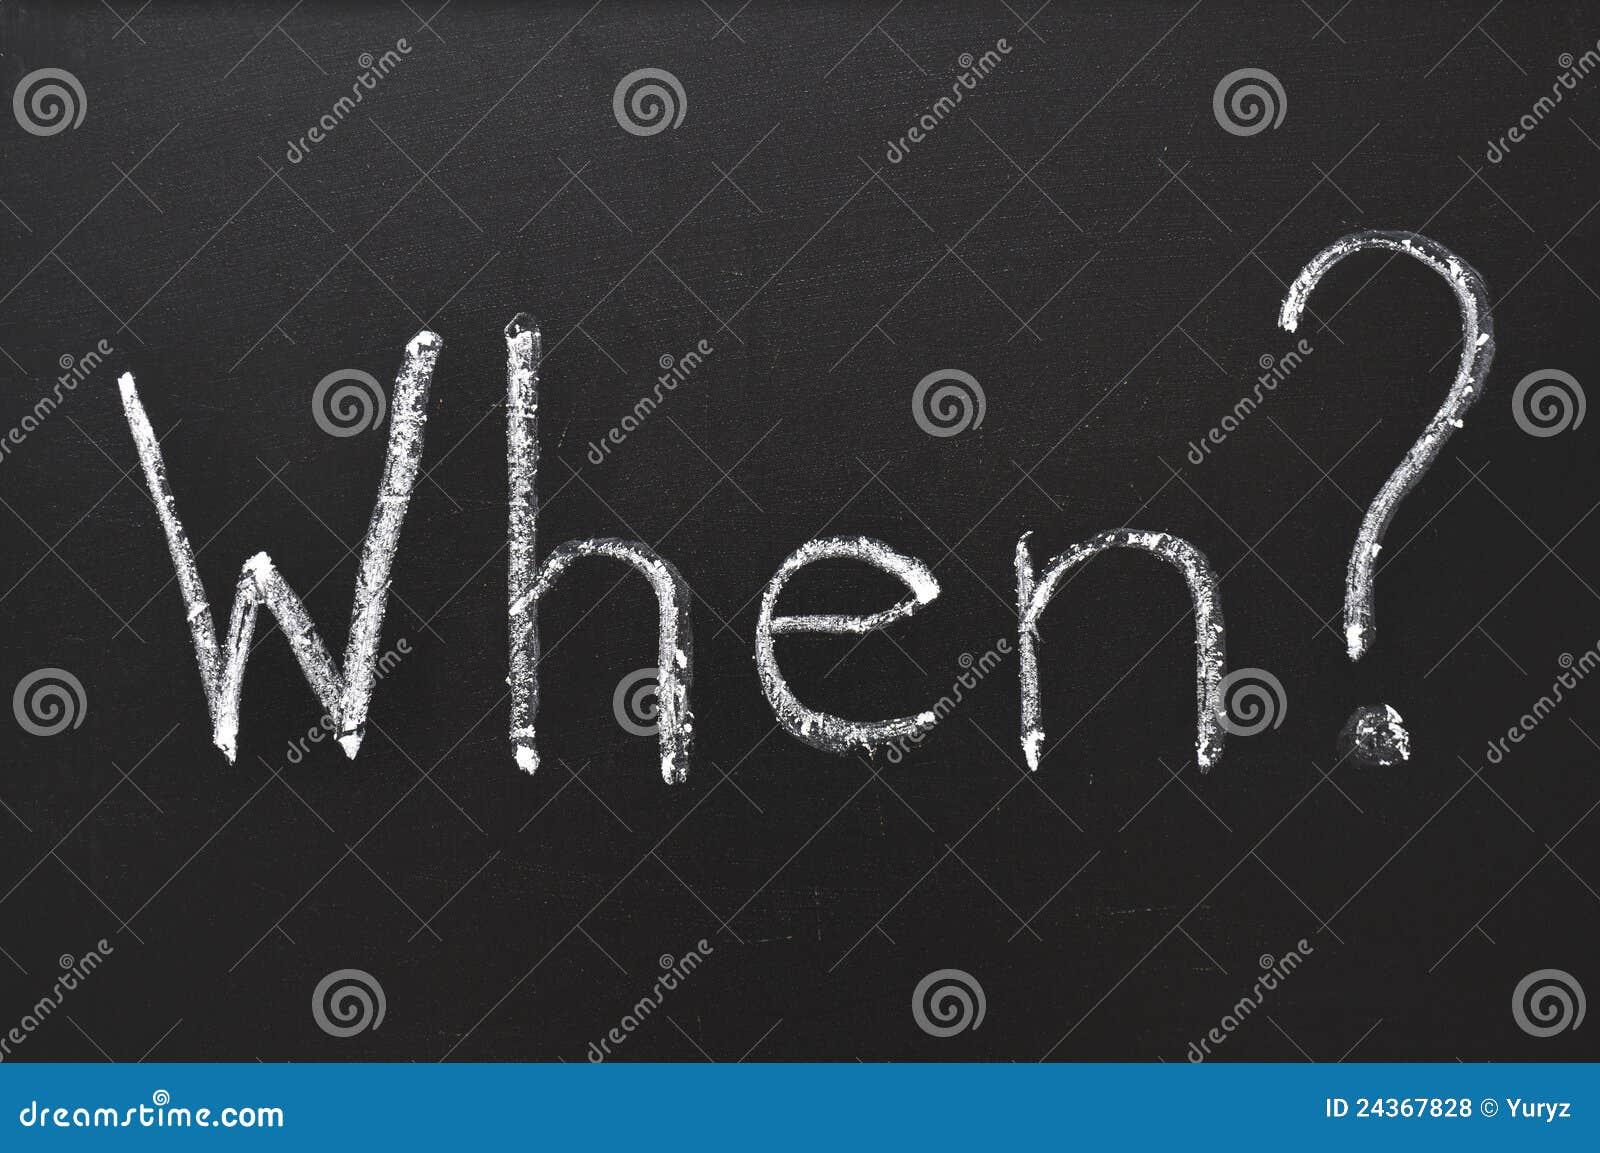 When question